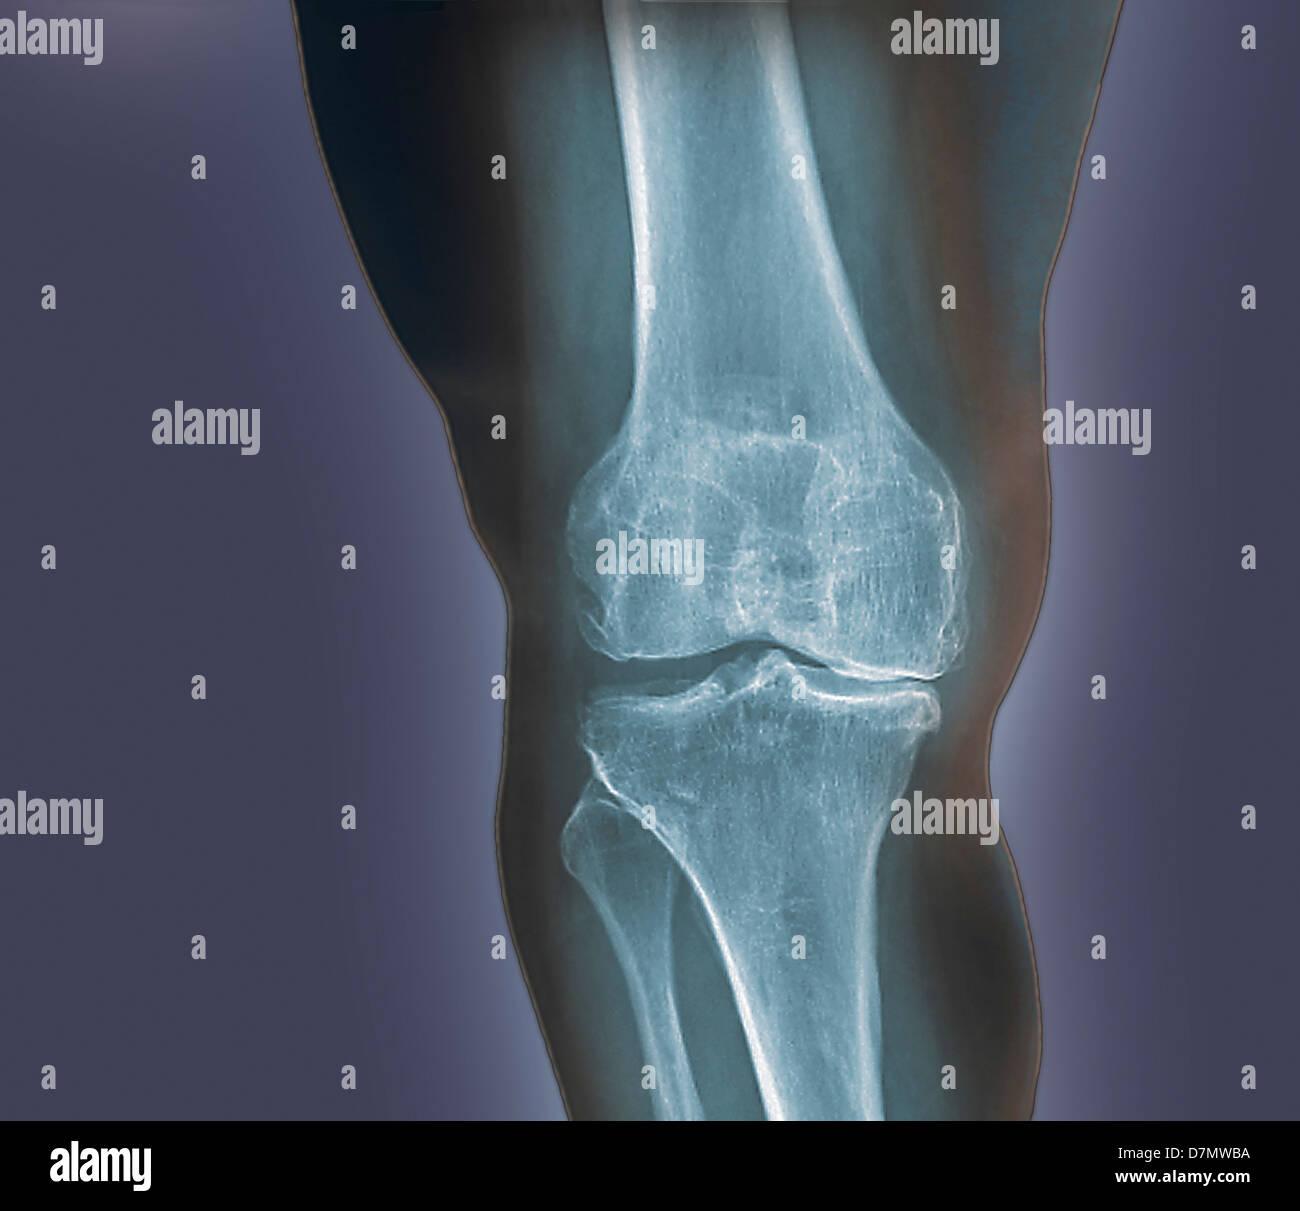 Arthritis des Knies, x-ray Stockbild